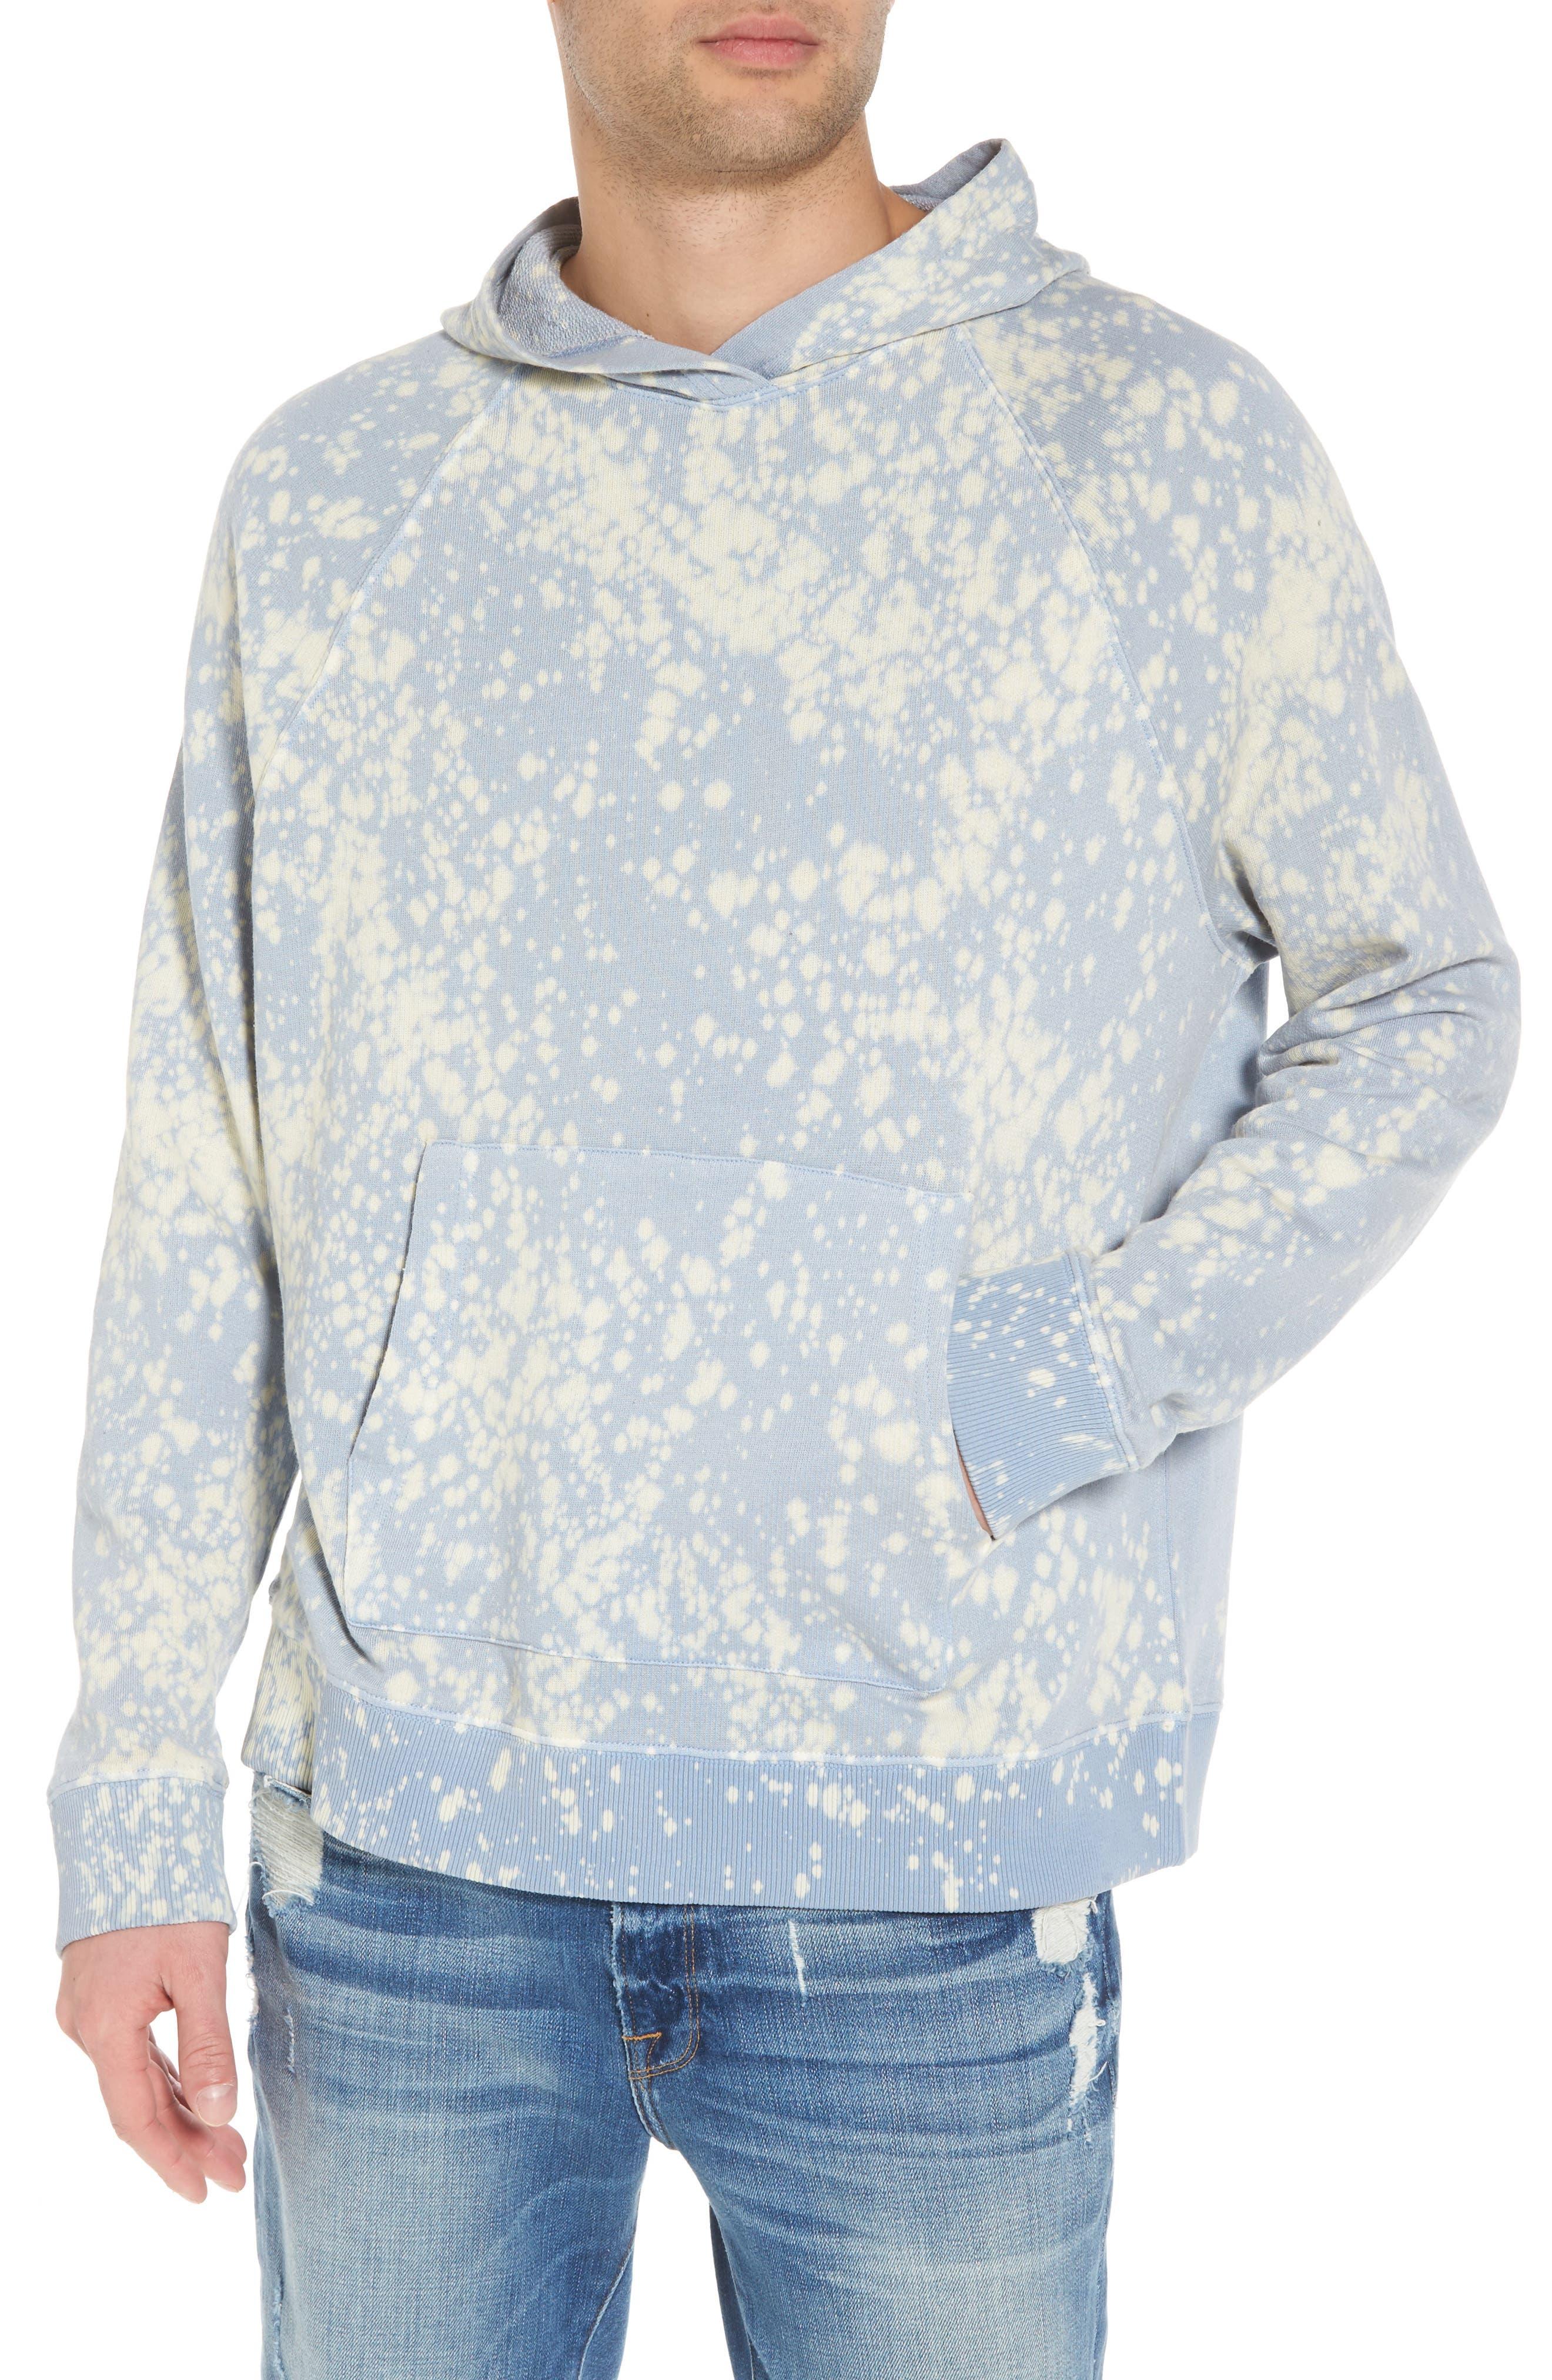 Bleached Hoodie Sweatshirt,                             Main thumbnail 1, color,                             450